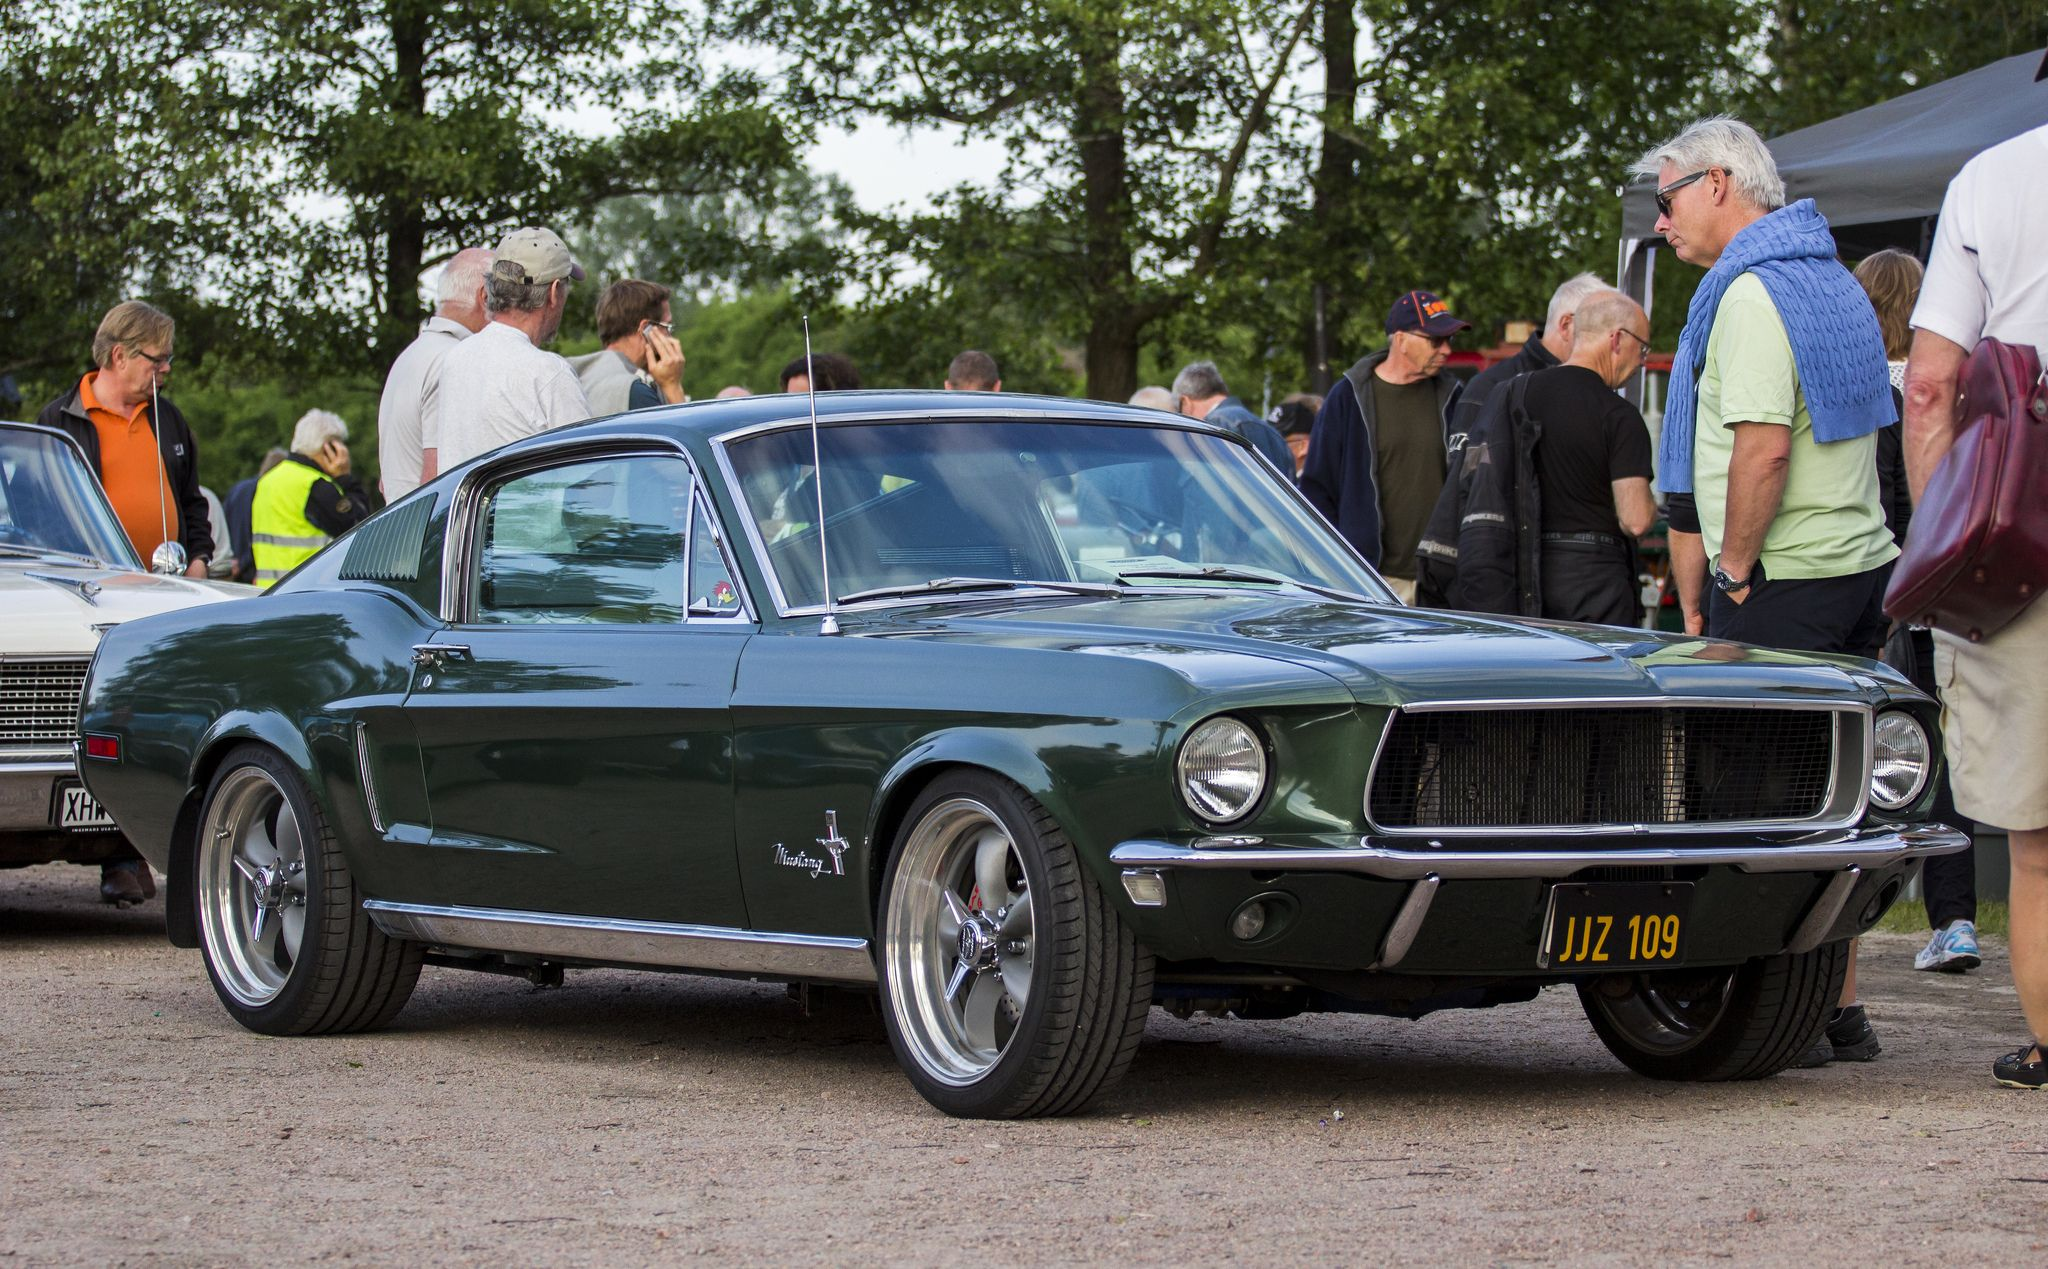 Ford Bullitt Mustang Fastback 67 Mustang Fastback Classic